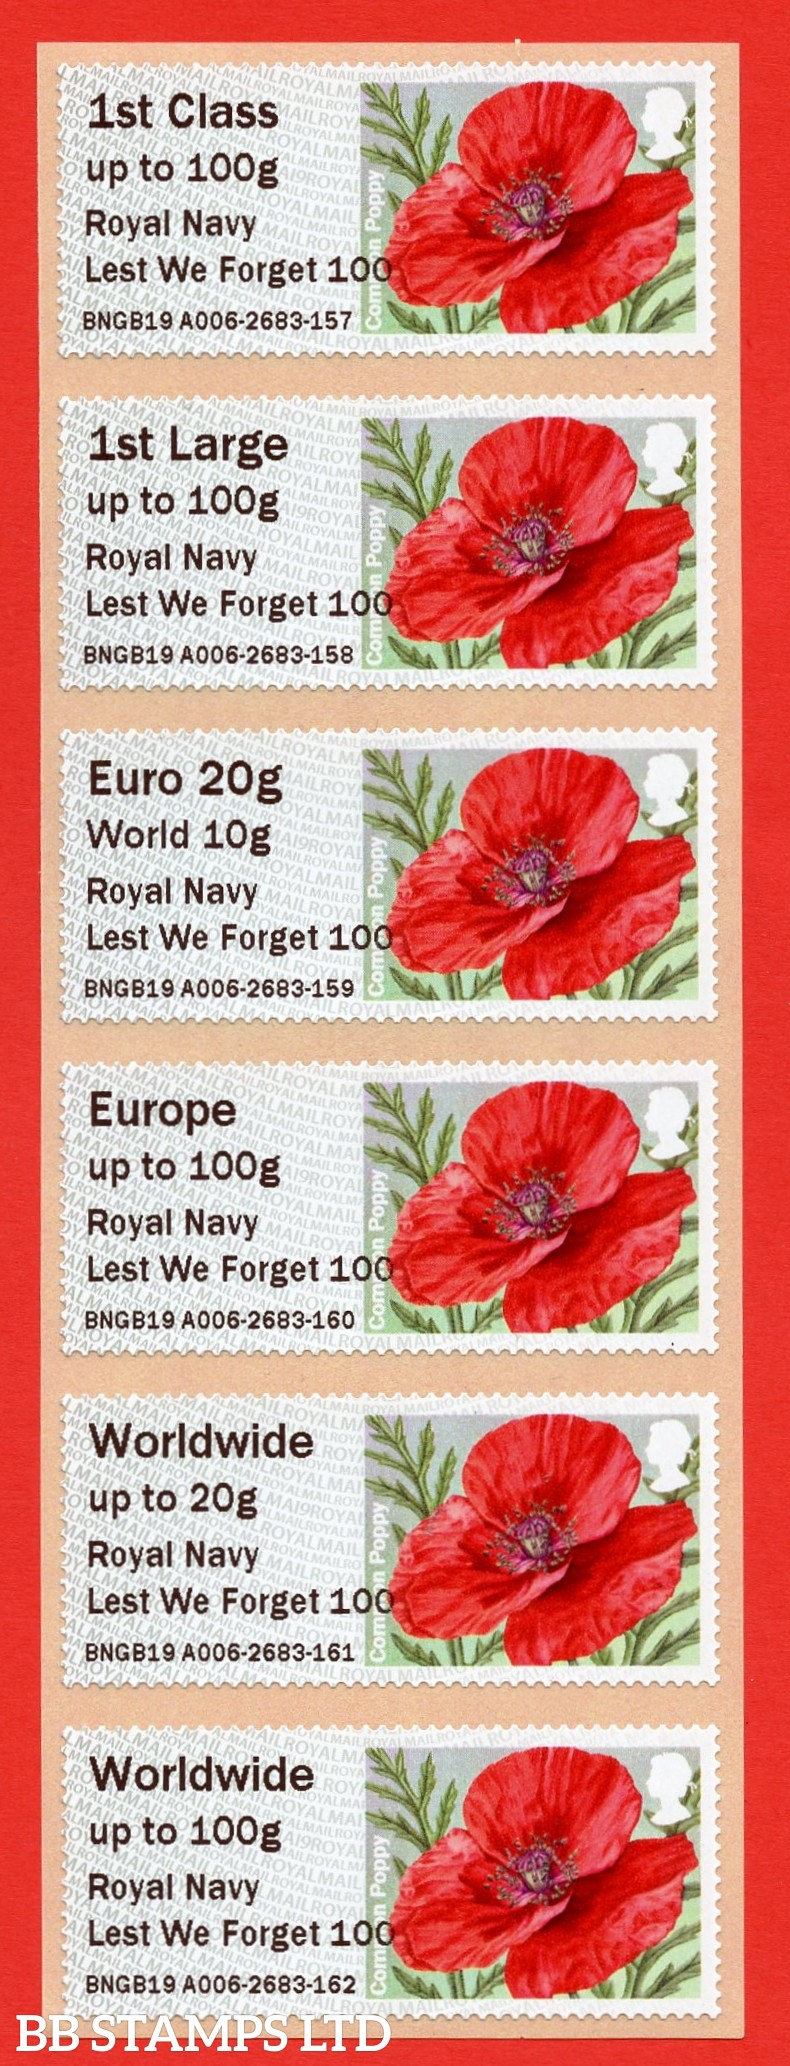 Poppy Royal Navy Lest We Forget 100 1st - W/Wide 100g MA19: TIIIA (BK29,P11)